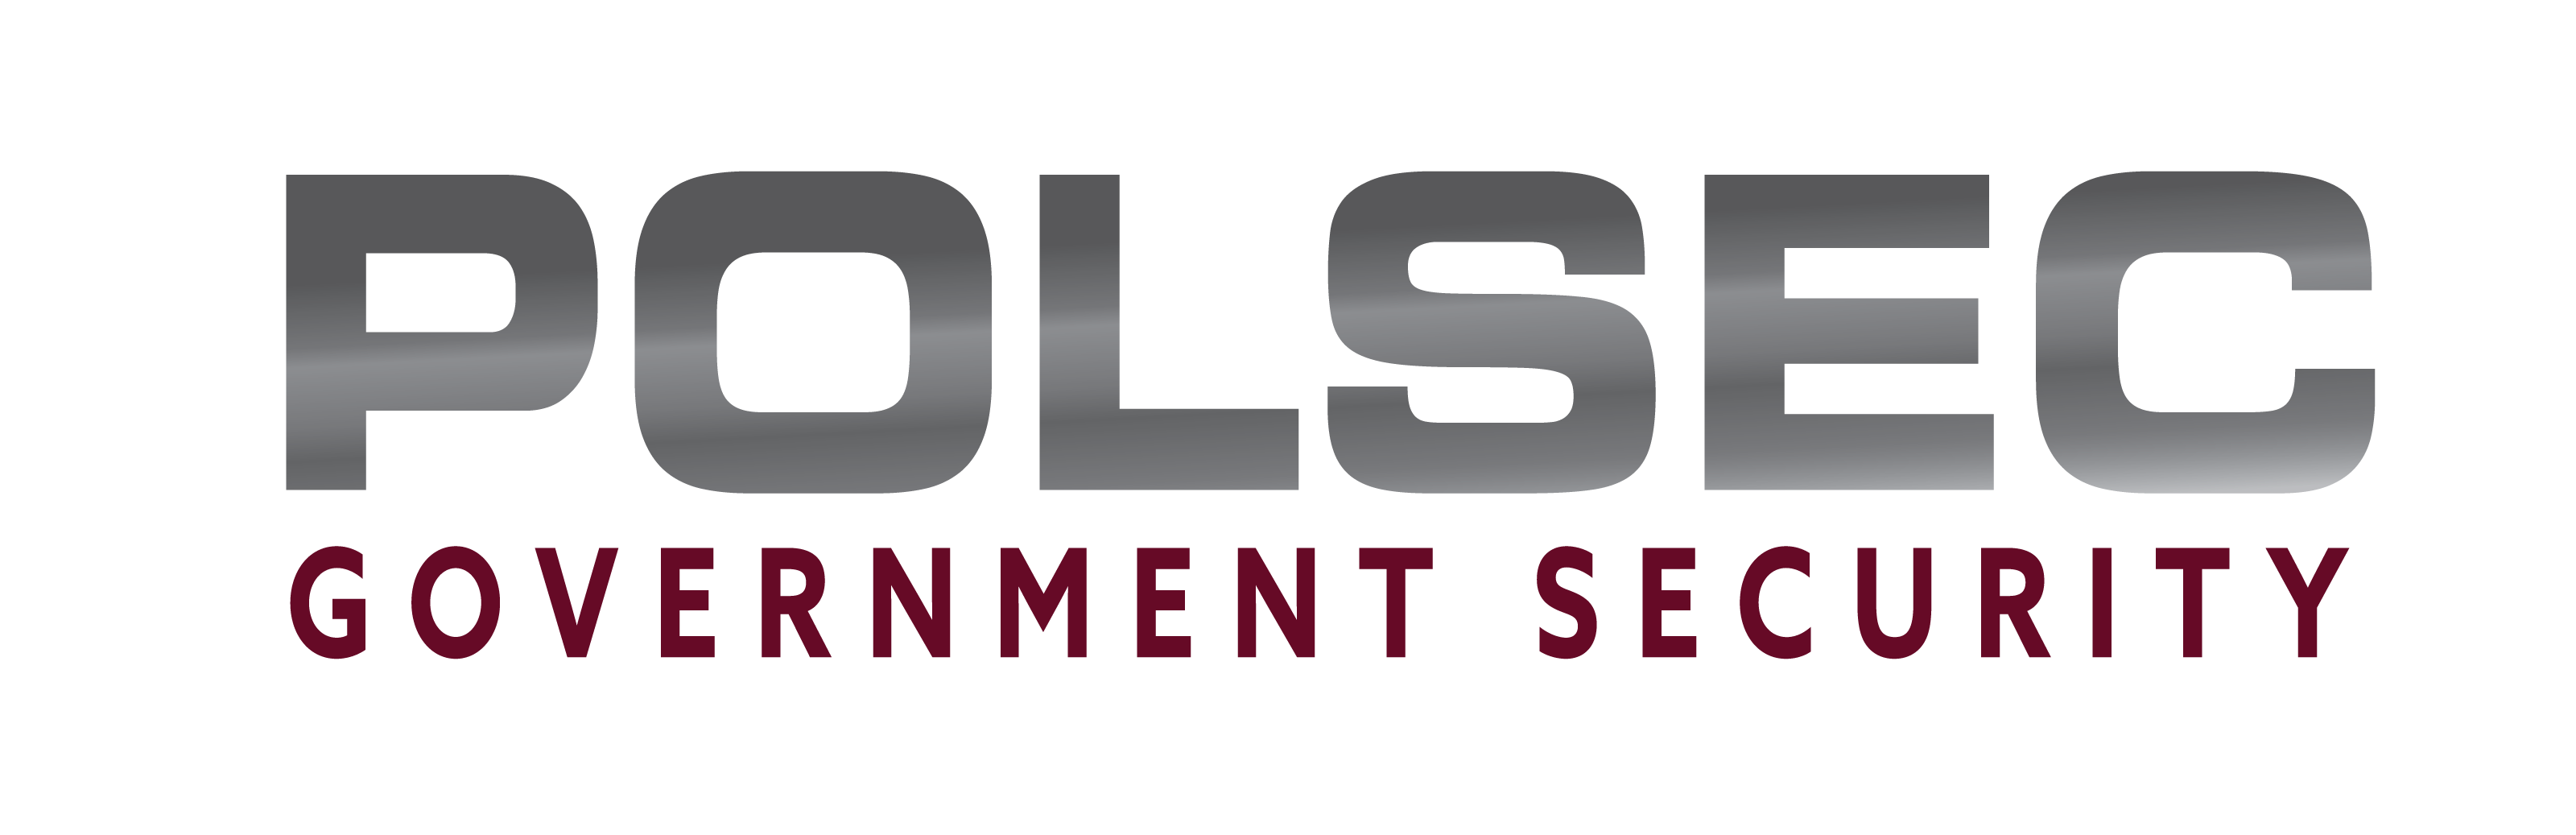 Polsec Logo-01